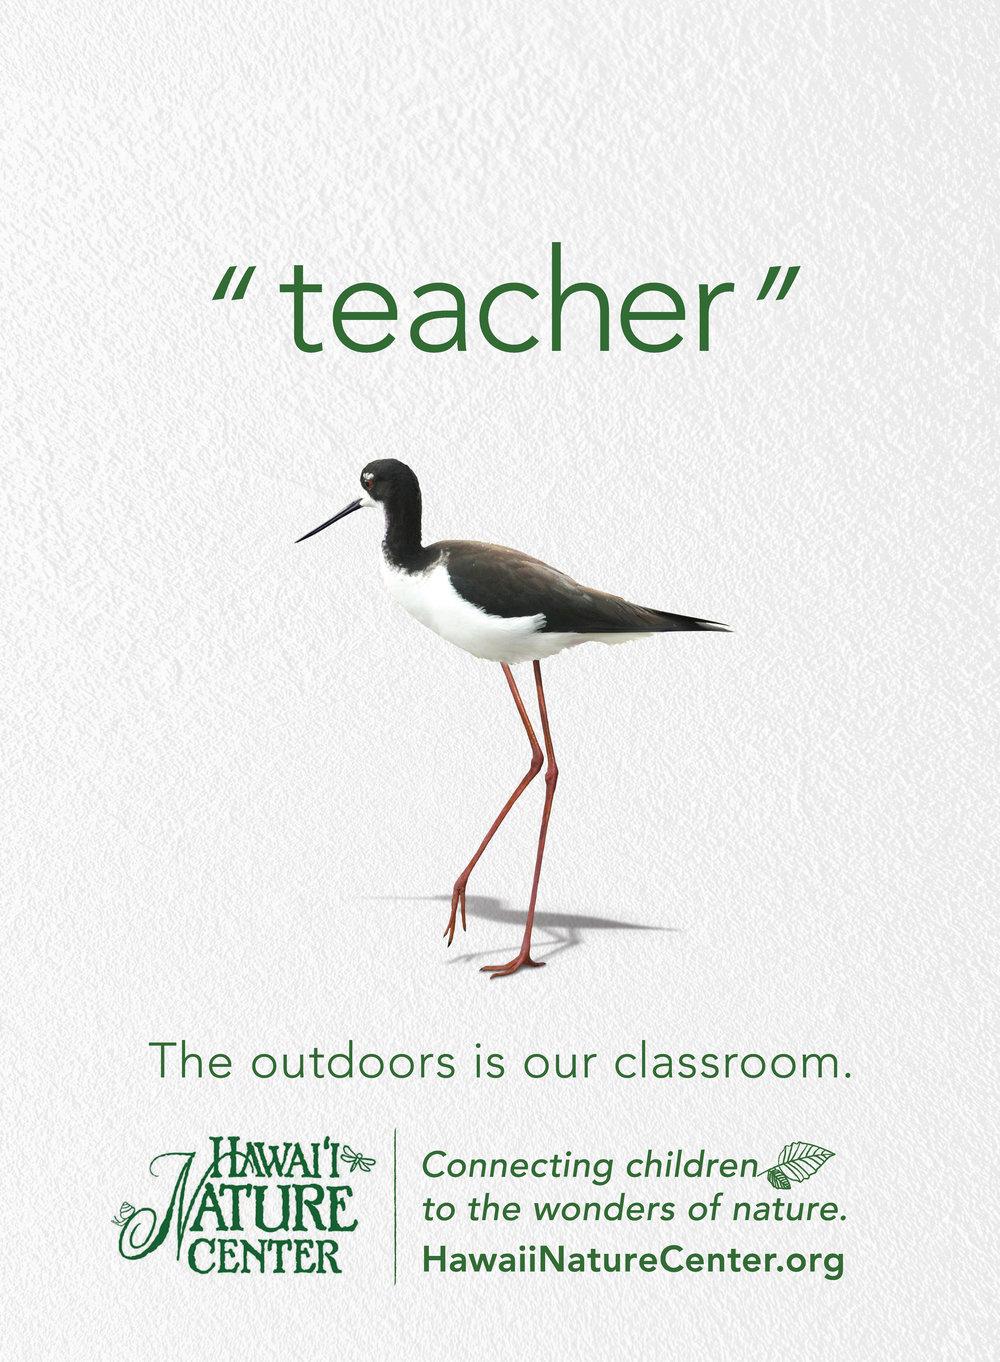 HNC_Classroom_Poster_Series 5.jpg